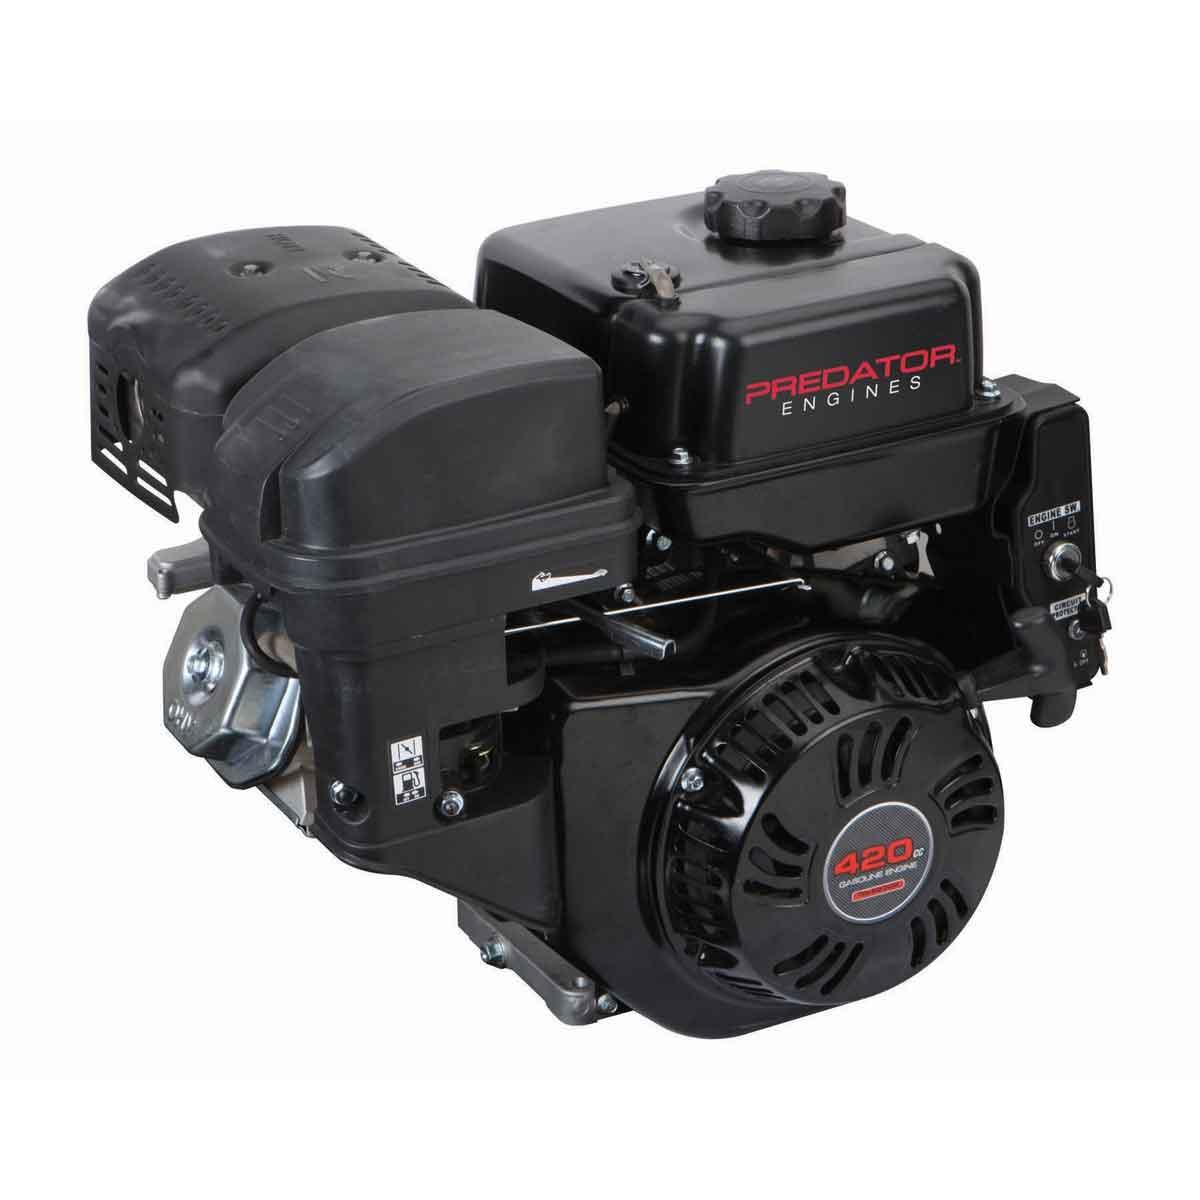 Kawasaki Small Engine Motor Oil